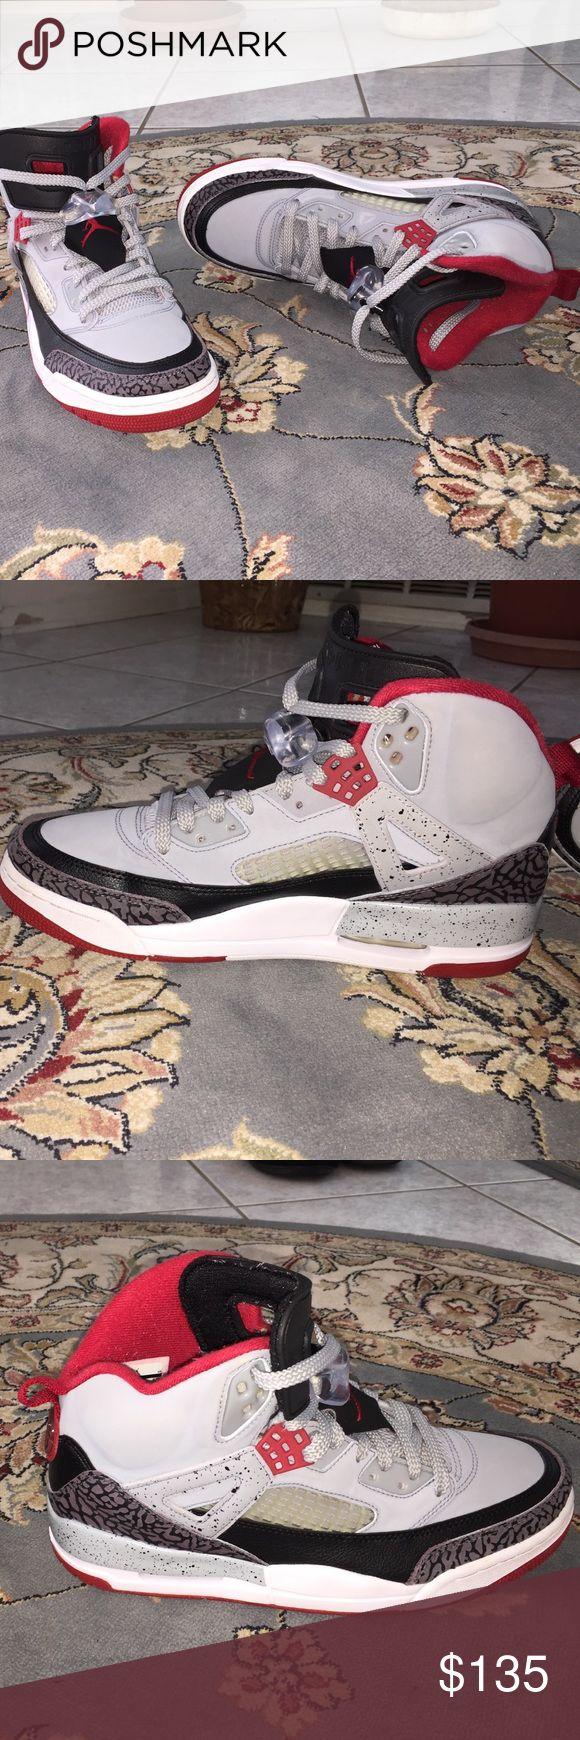 Nike Air Jordan Iv 4 Mars Spike Lee Brooklyn Very good condition,No scratch, nice look men Jordan shoes. Best price, nice gift for Christmas! Jordan Shoes Athletic Shoes